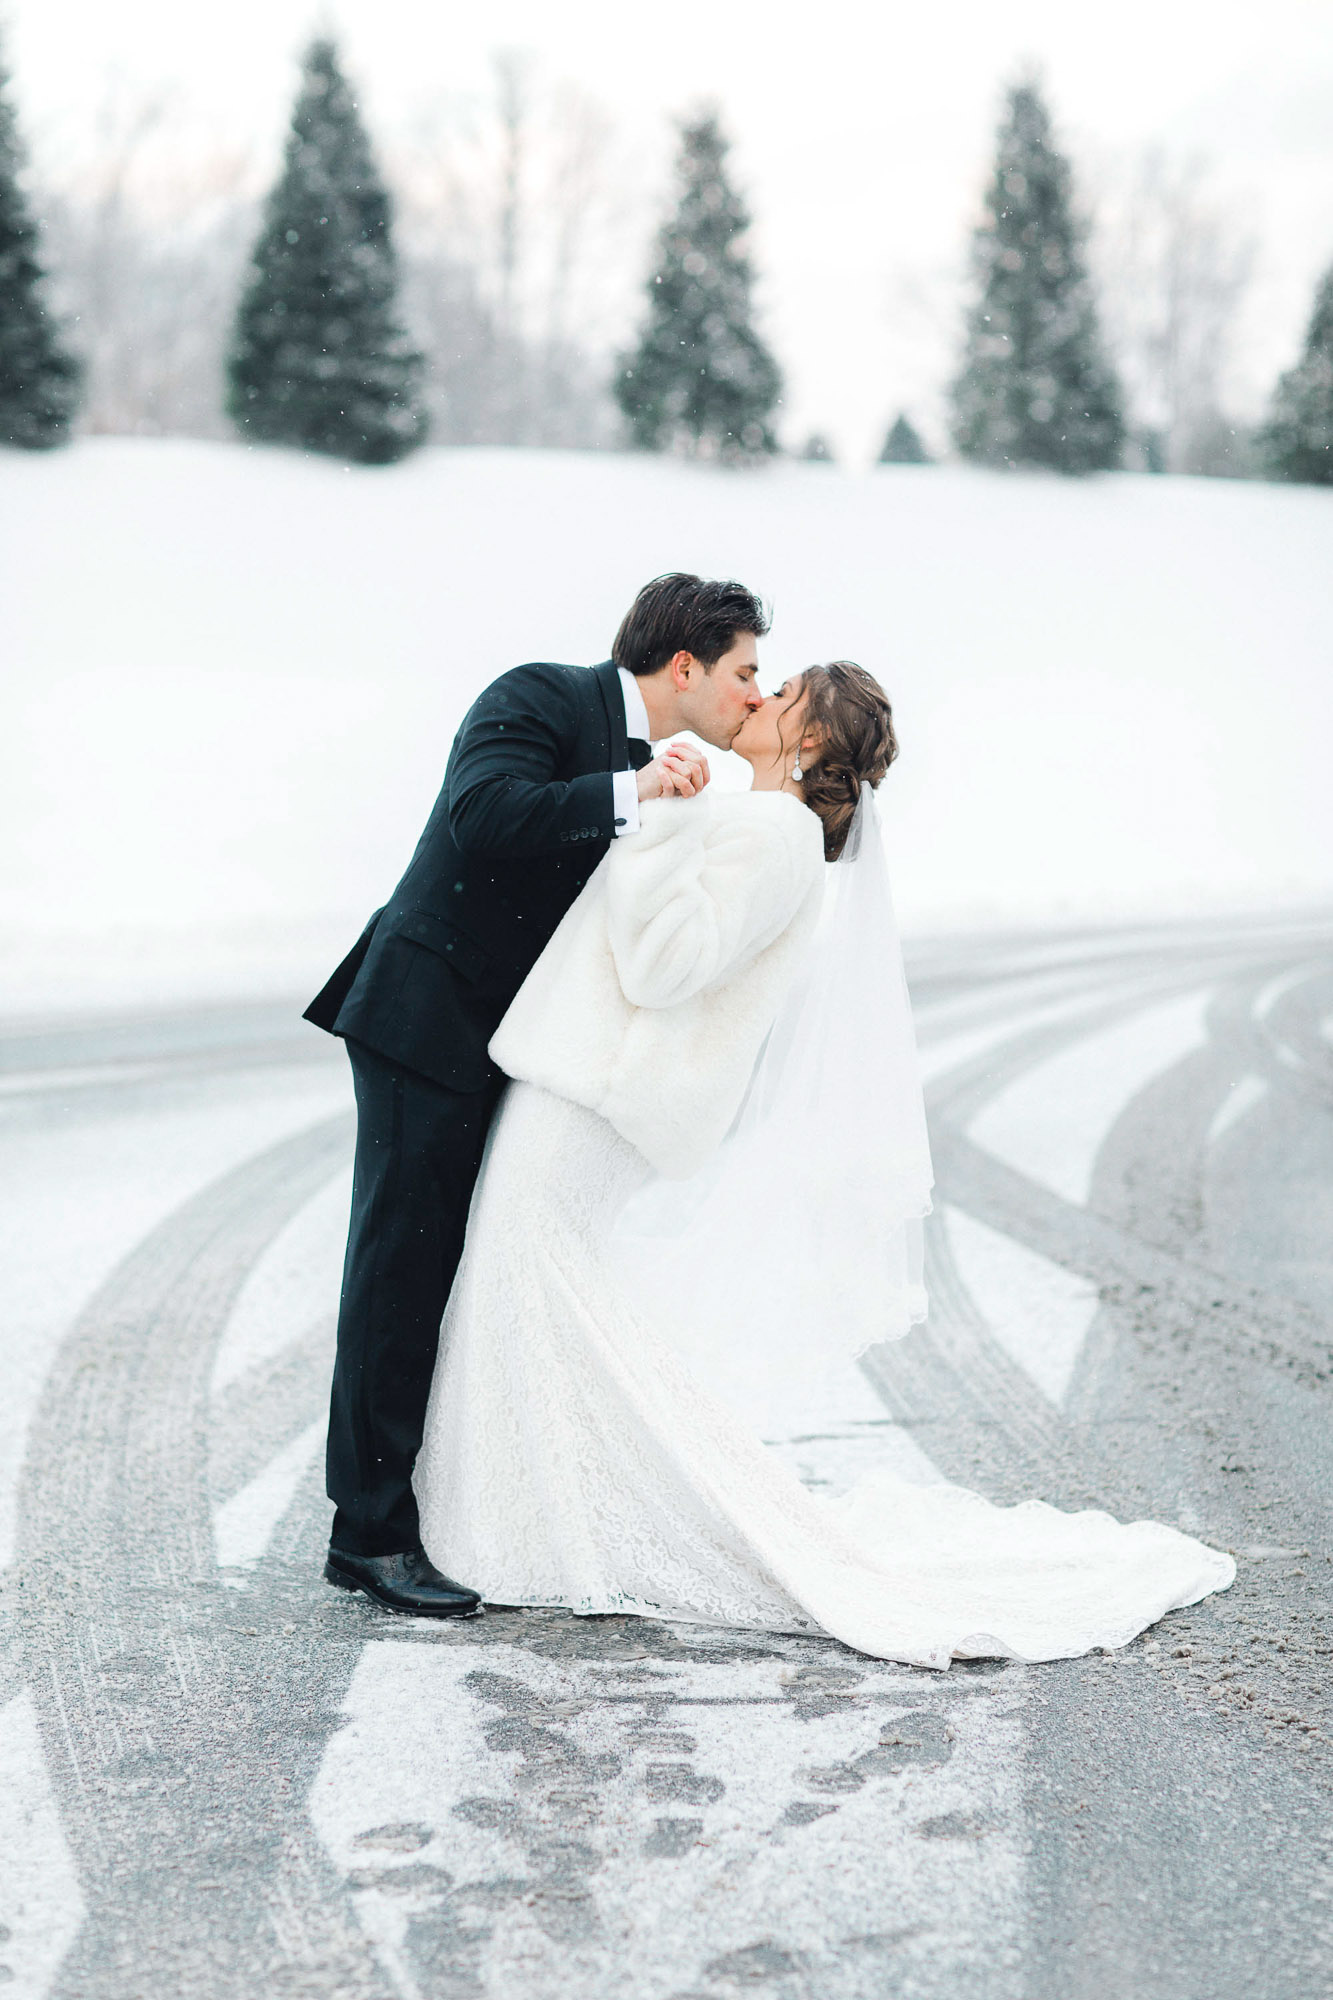 snowy-sand-springs-country-club-drums-pa-christmas-wedding-24755.jpg